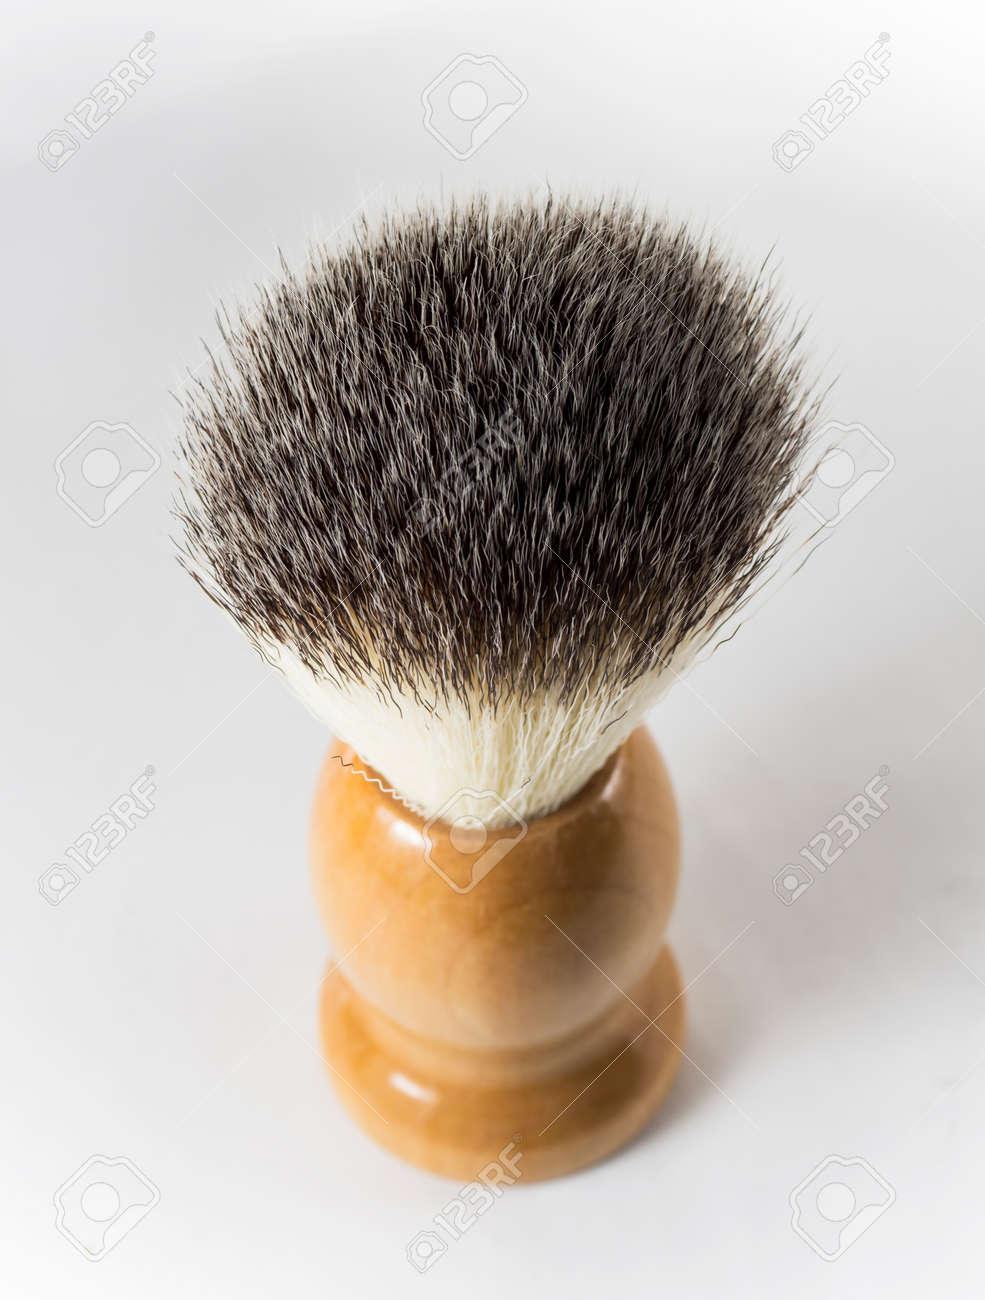 One shaving brush on white background - 158440244